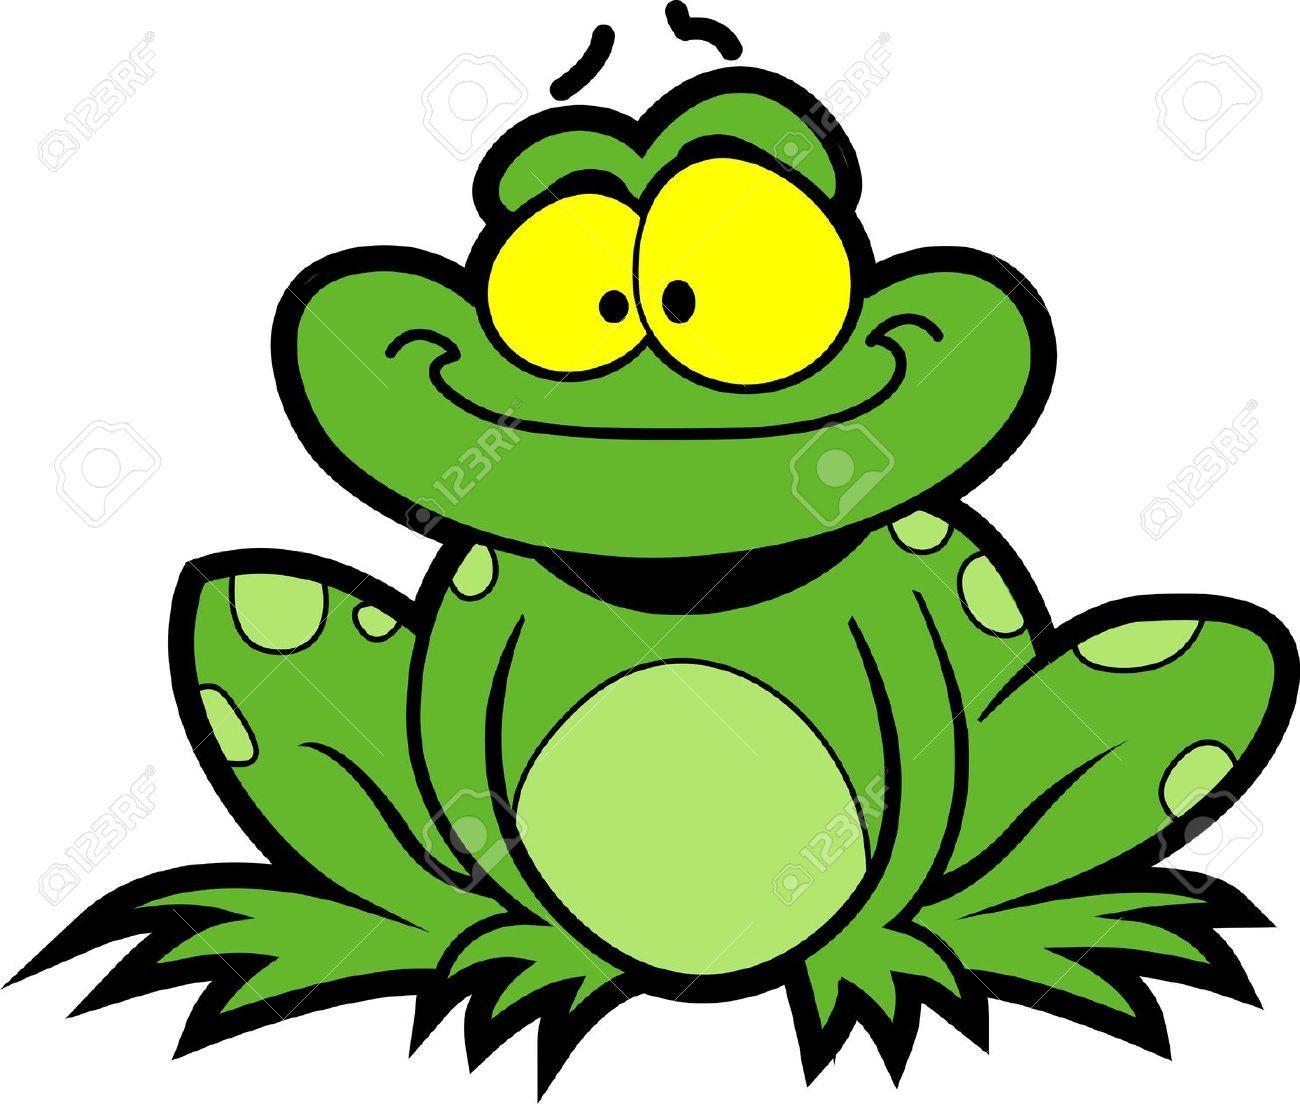 Resultado De Imagem Para Sapo Desenho Animated Frog Frog Illustration Cute Frogs